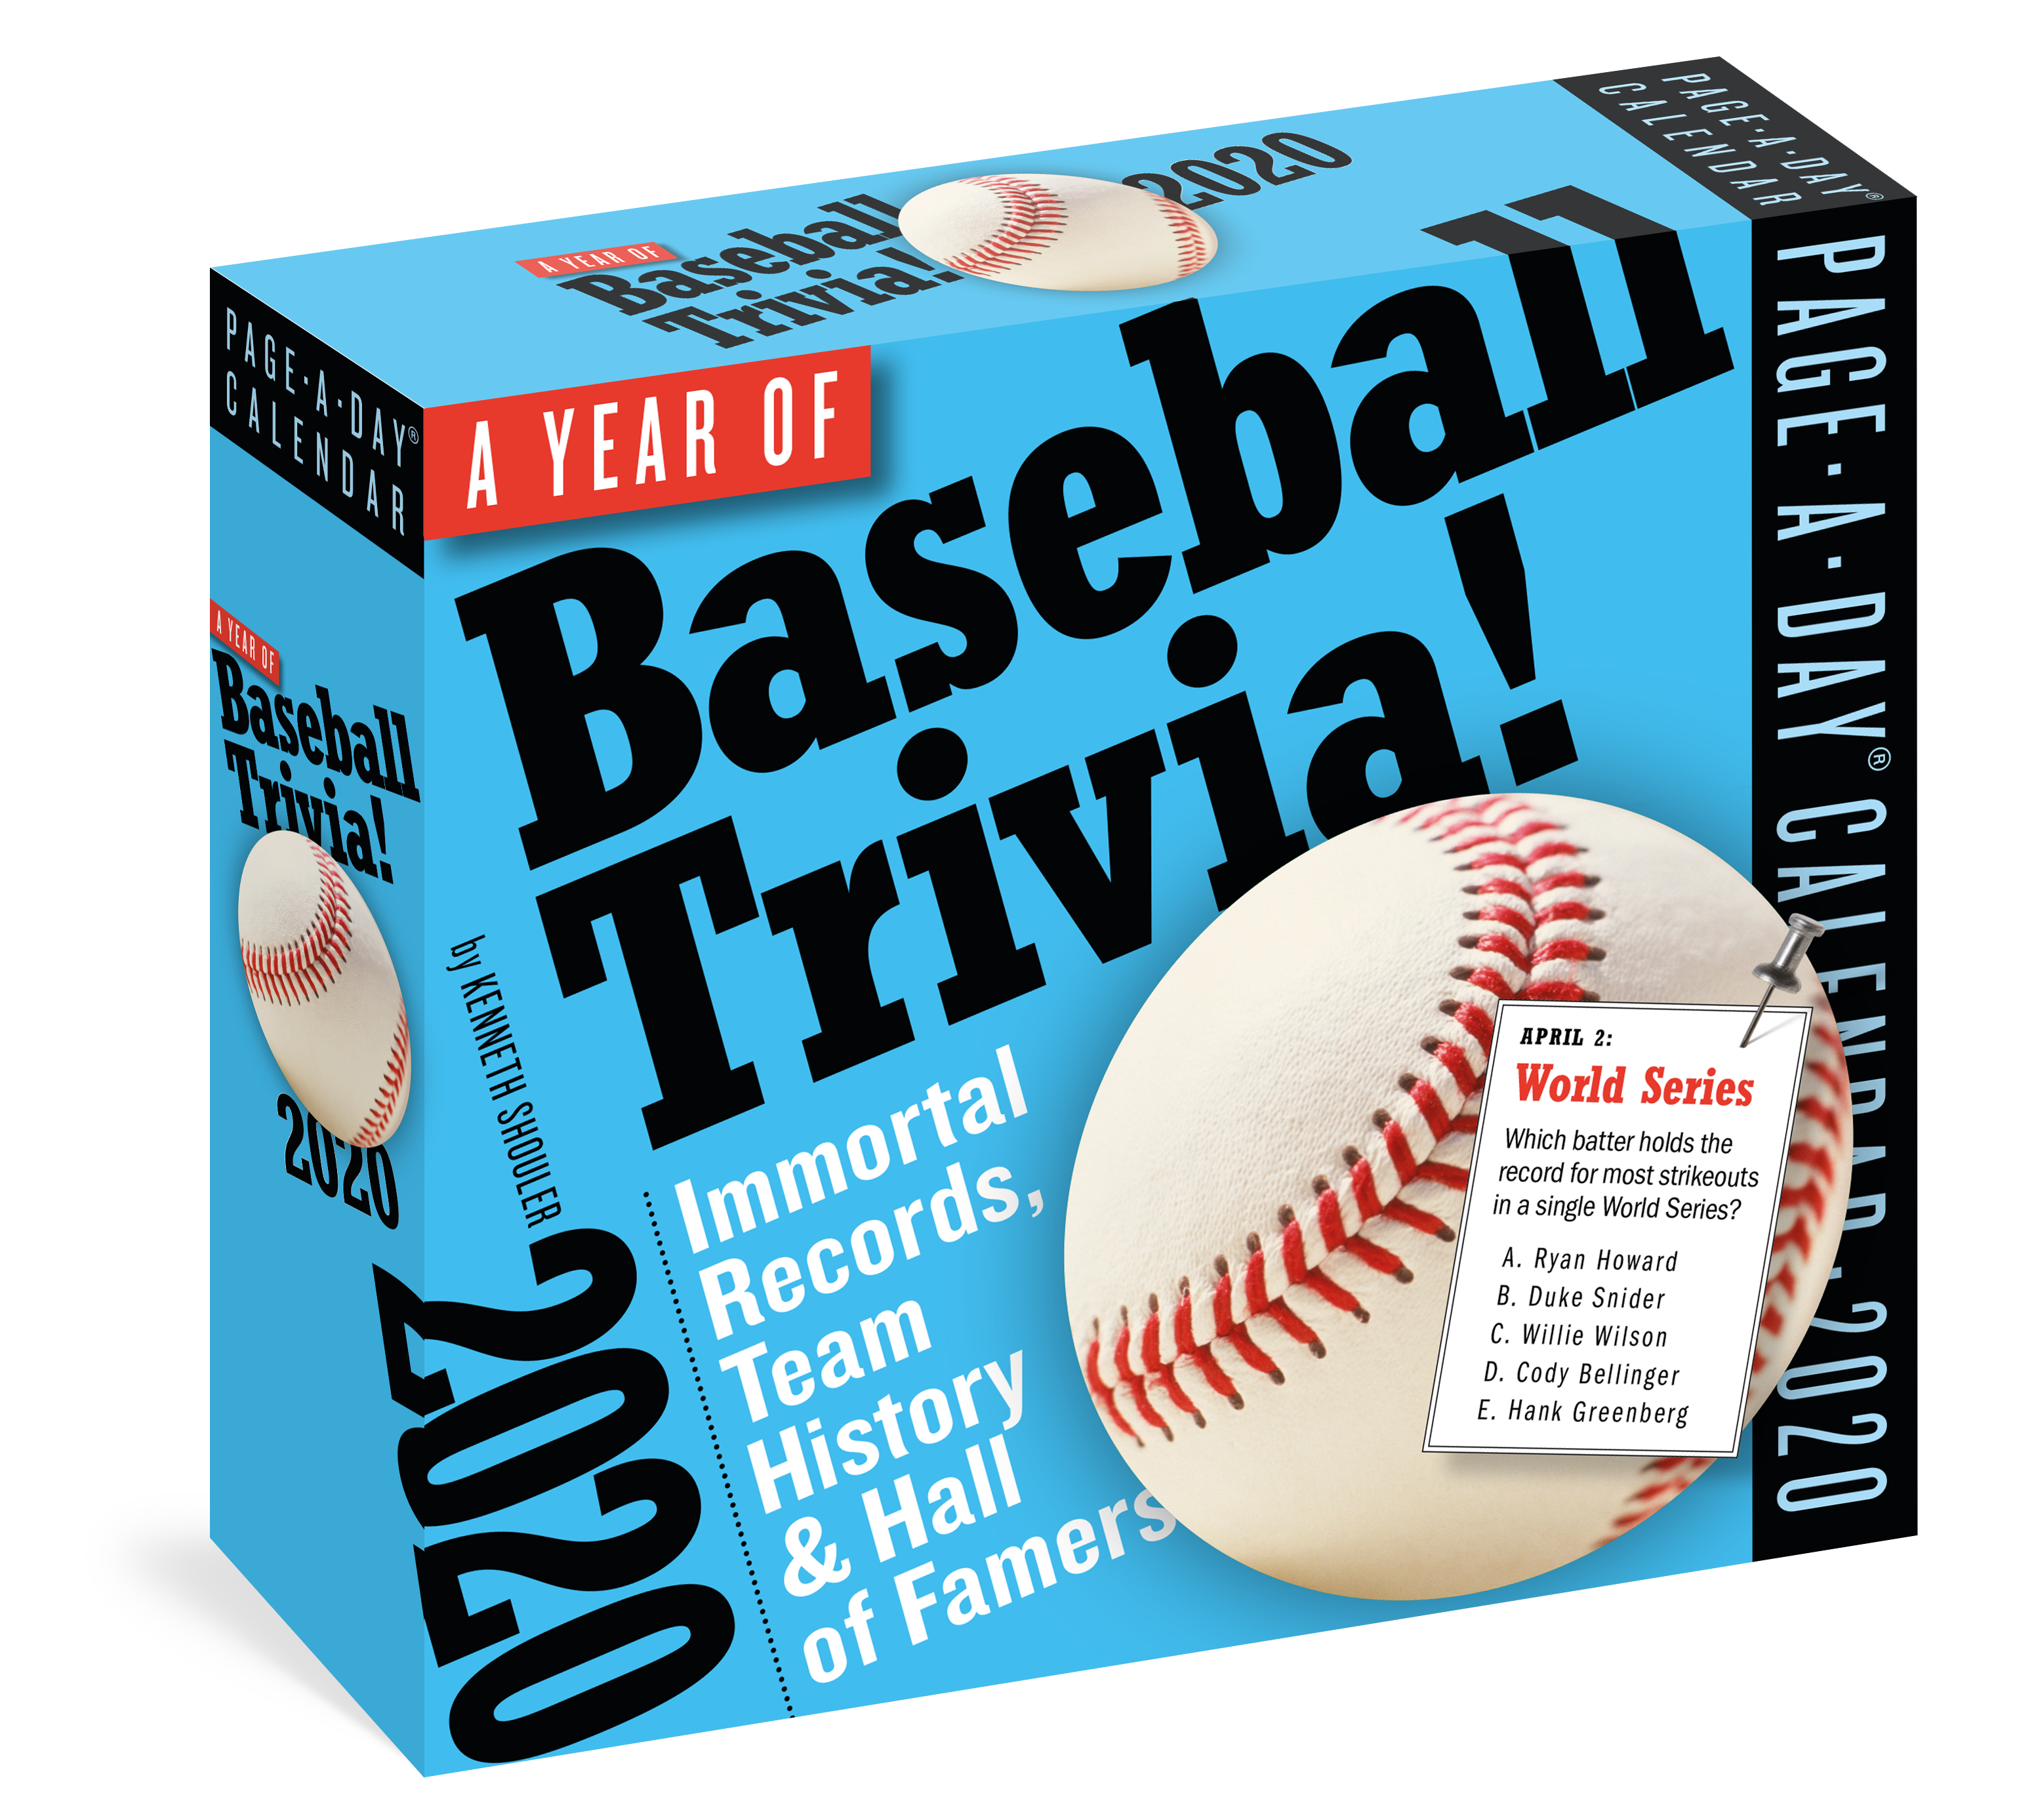 Baseball Calendar 2020 A Year of Baseball Trivia! Page A Day Calendar 2020   Workman